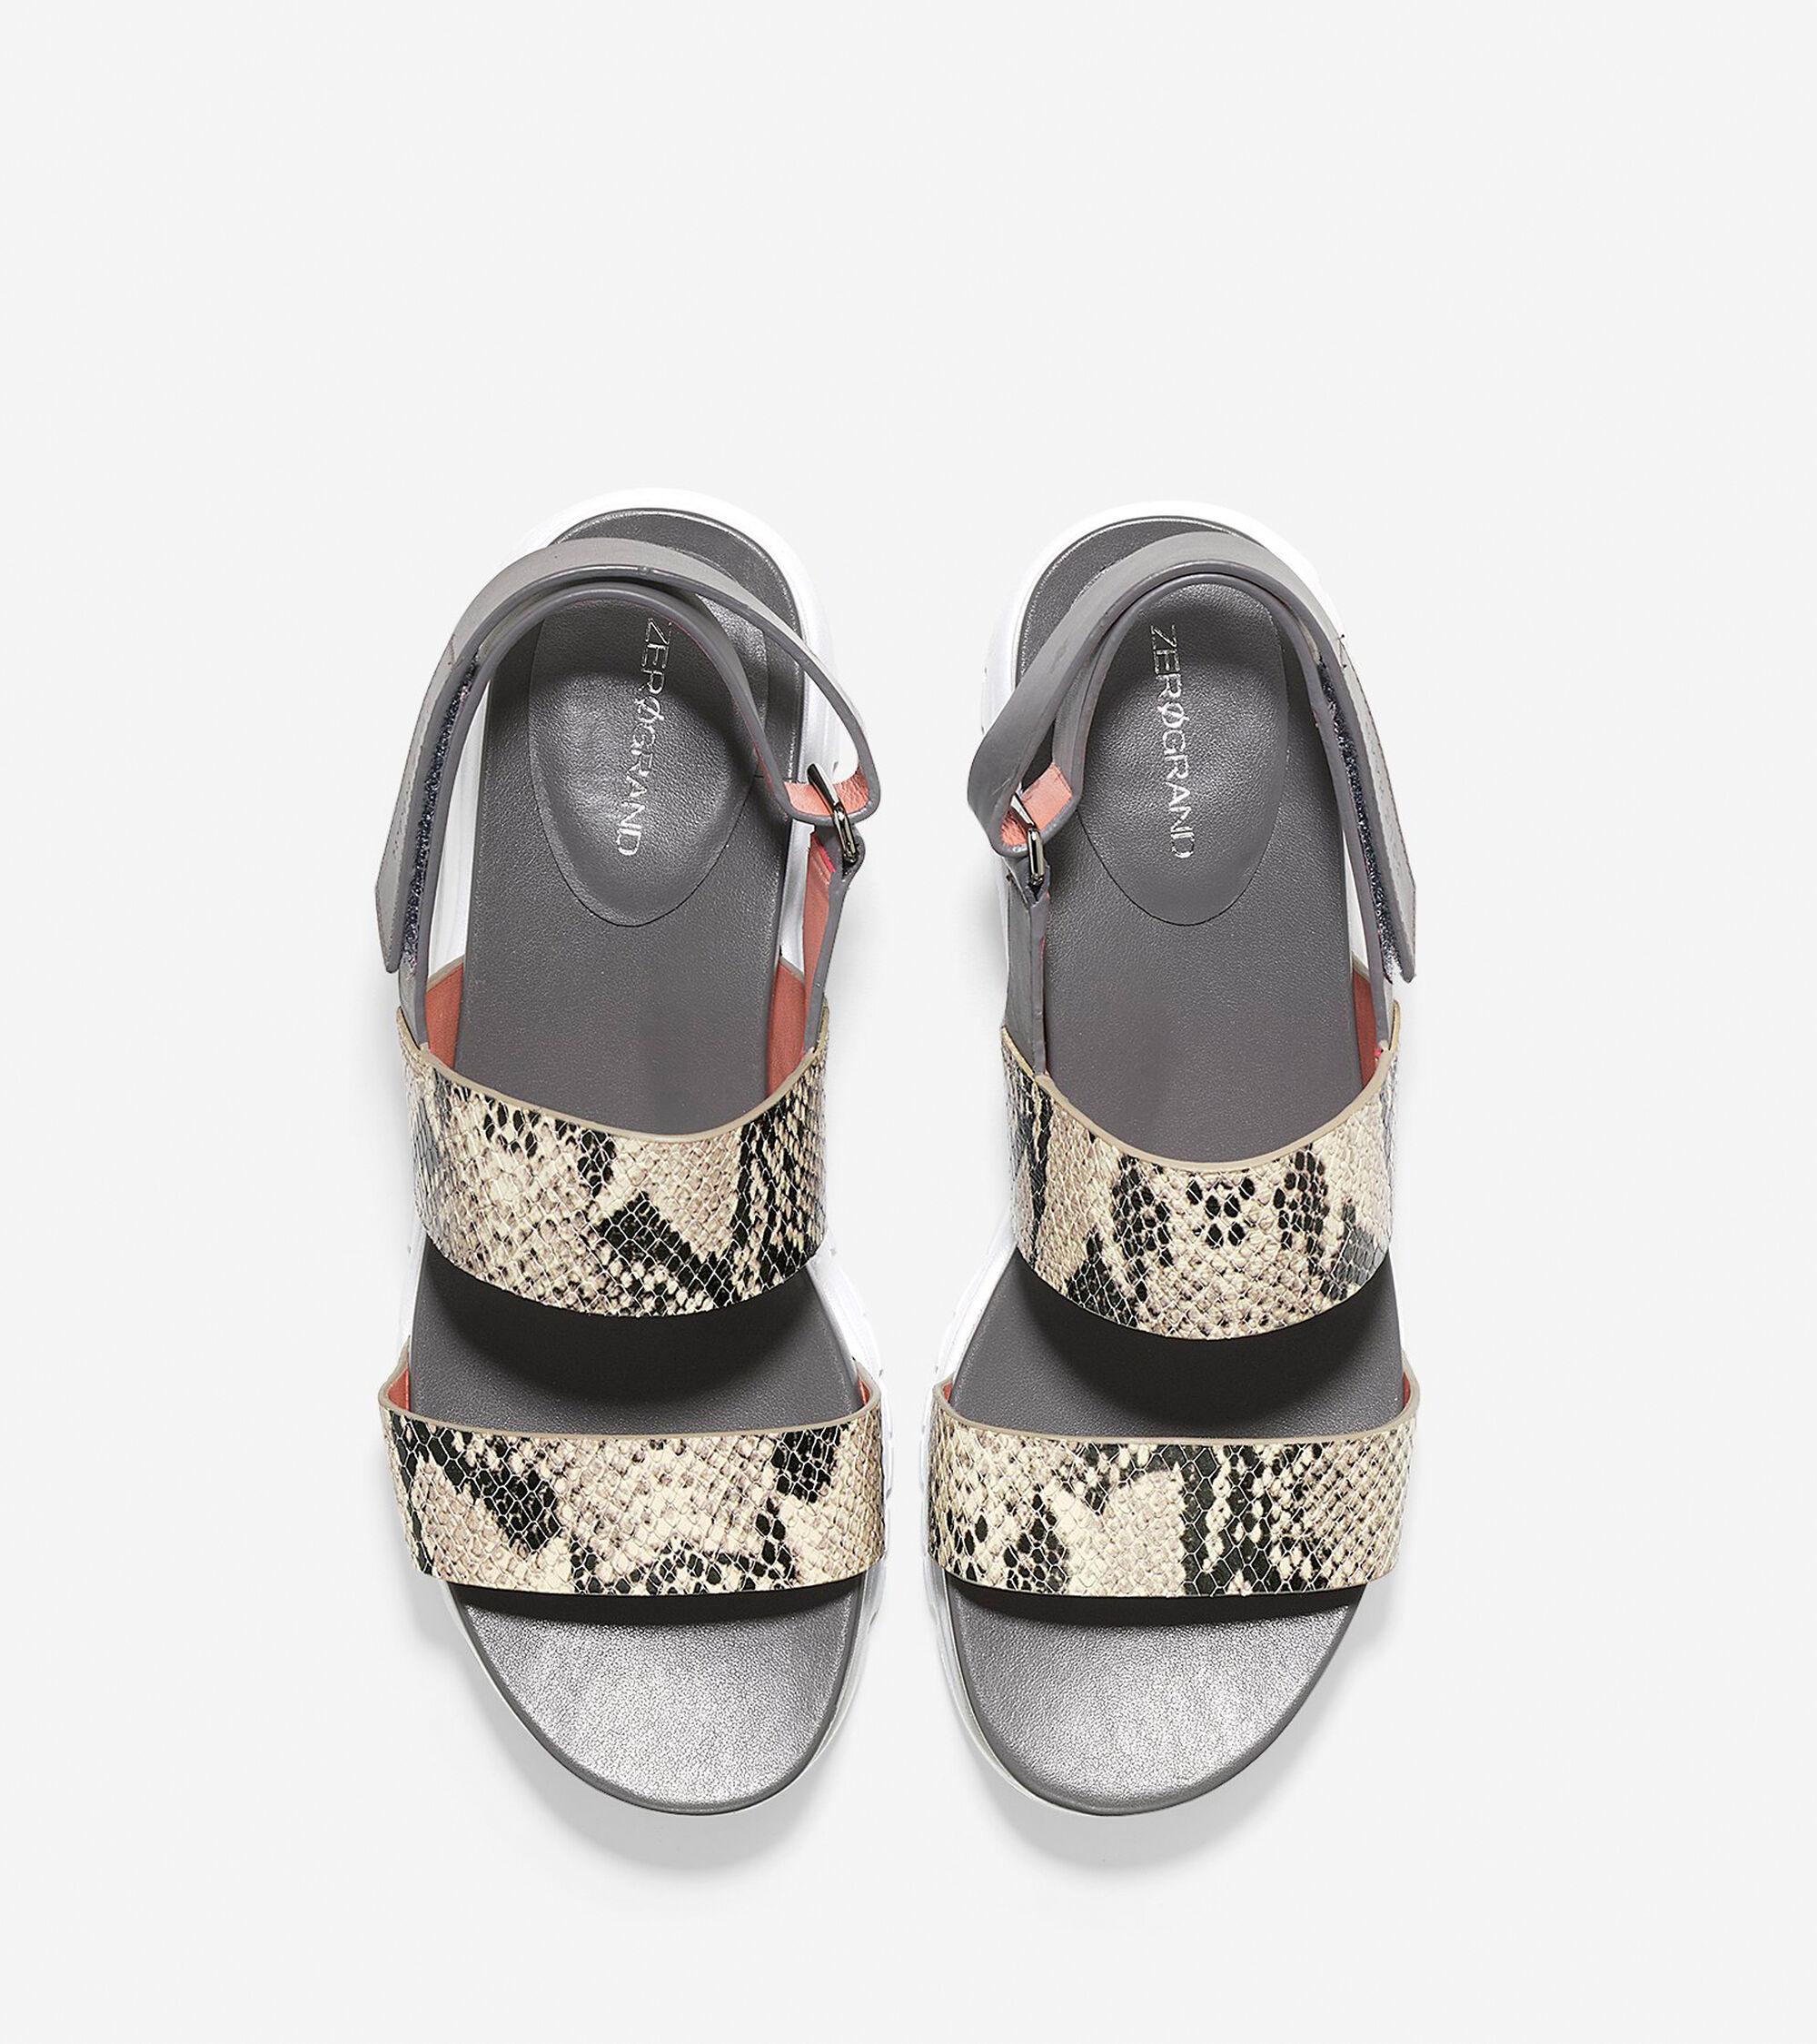 d2e85555b ZEROGRAND Slide Sandals in Roccia Snake